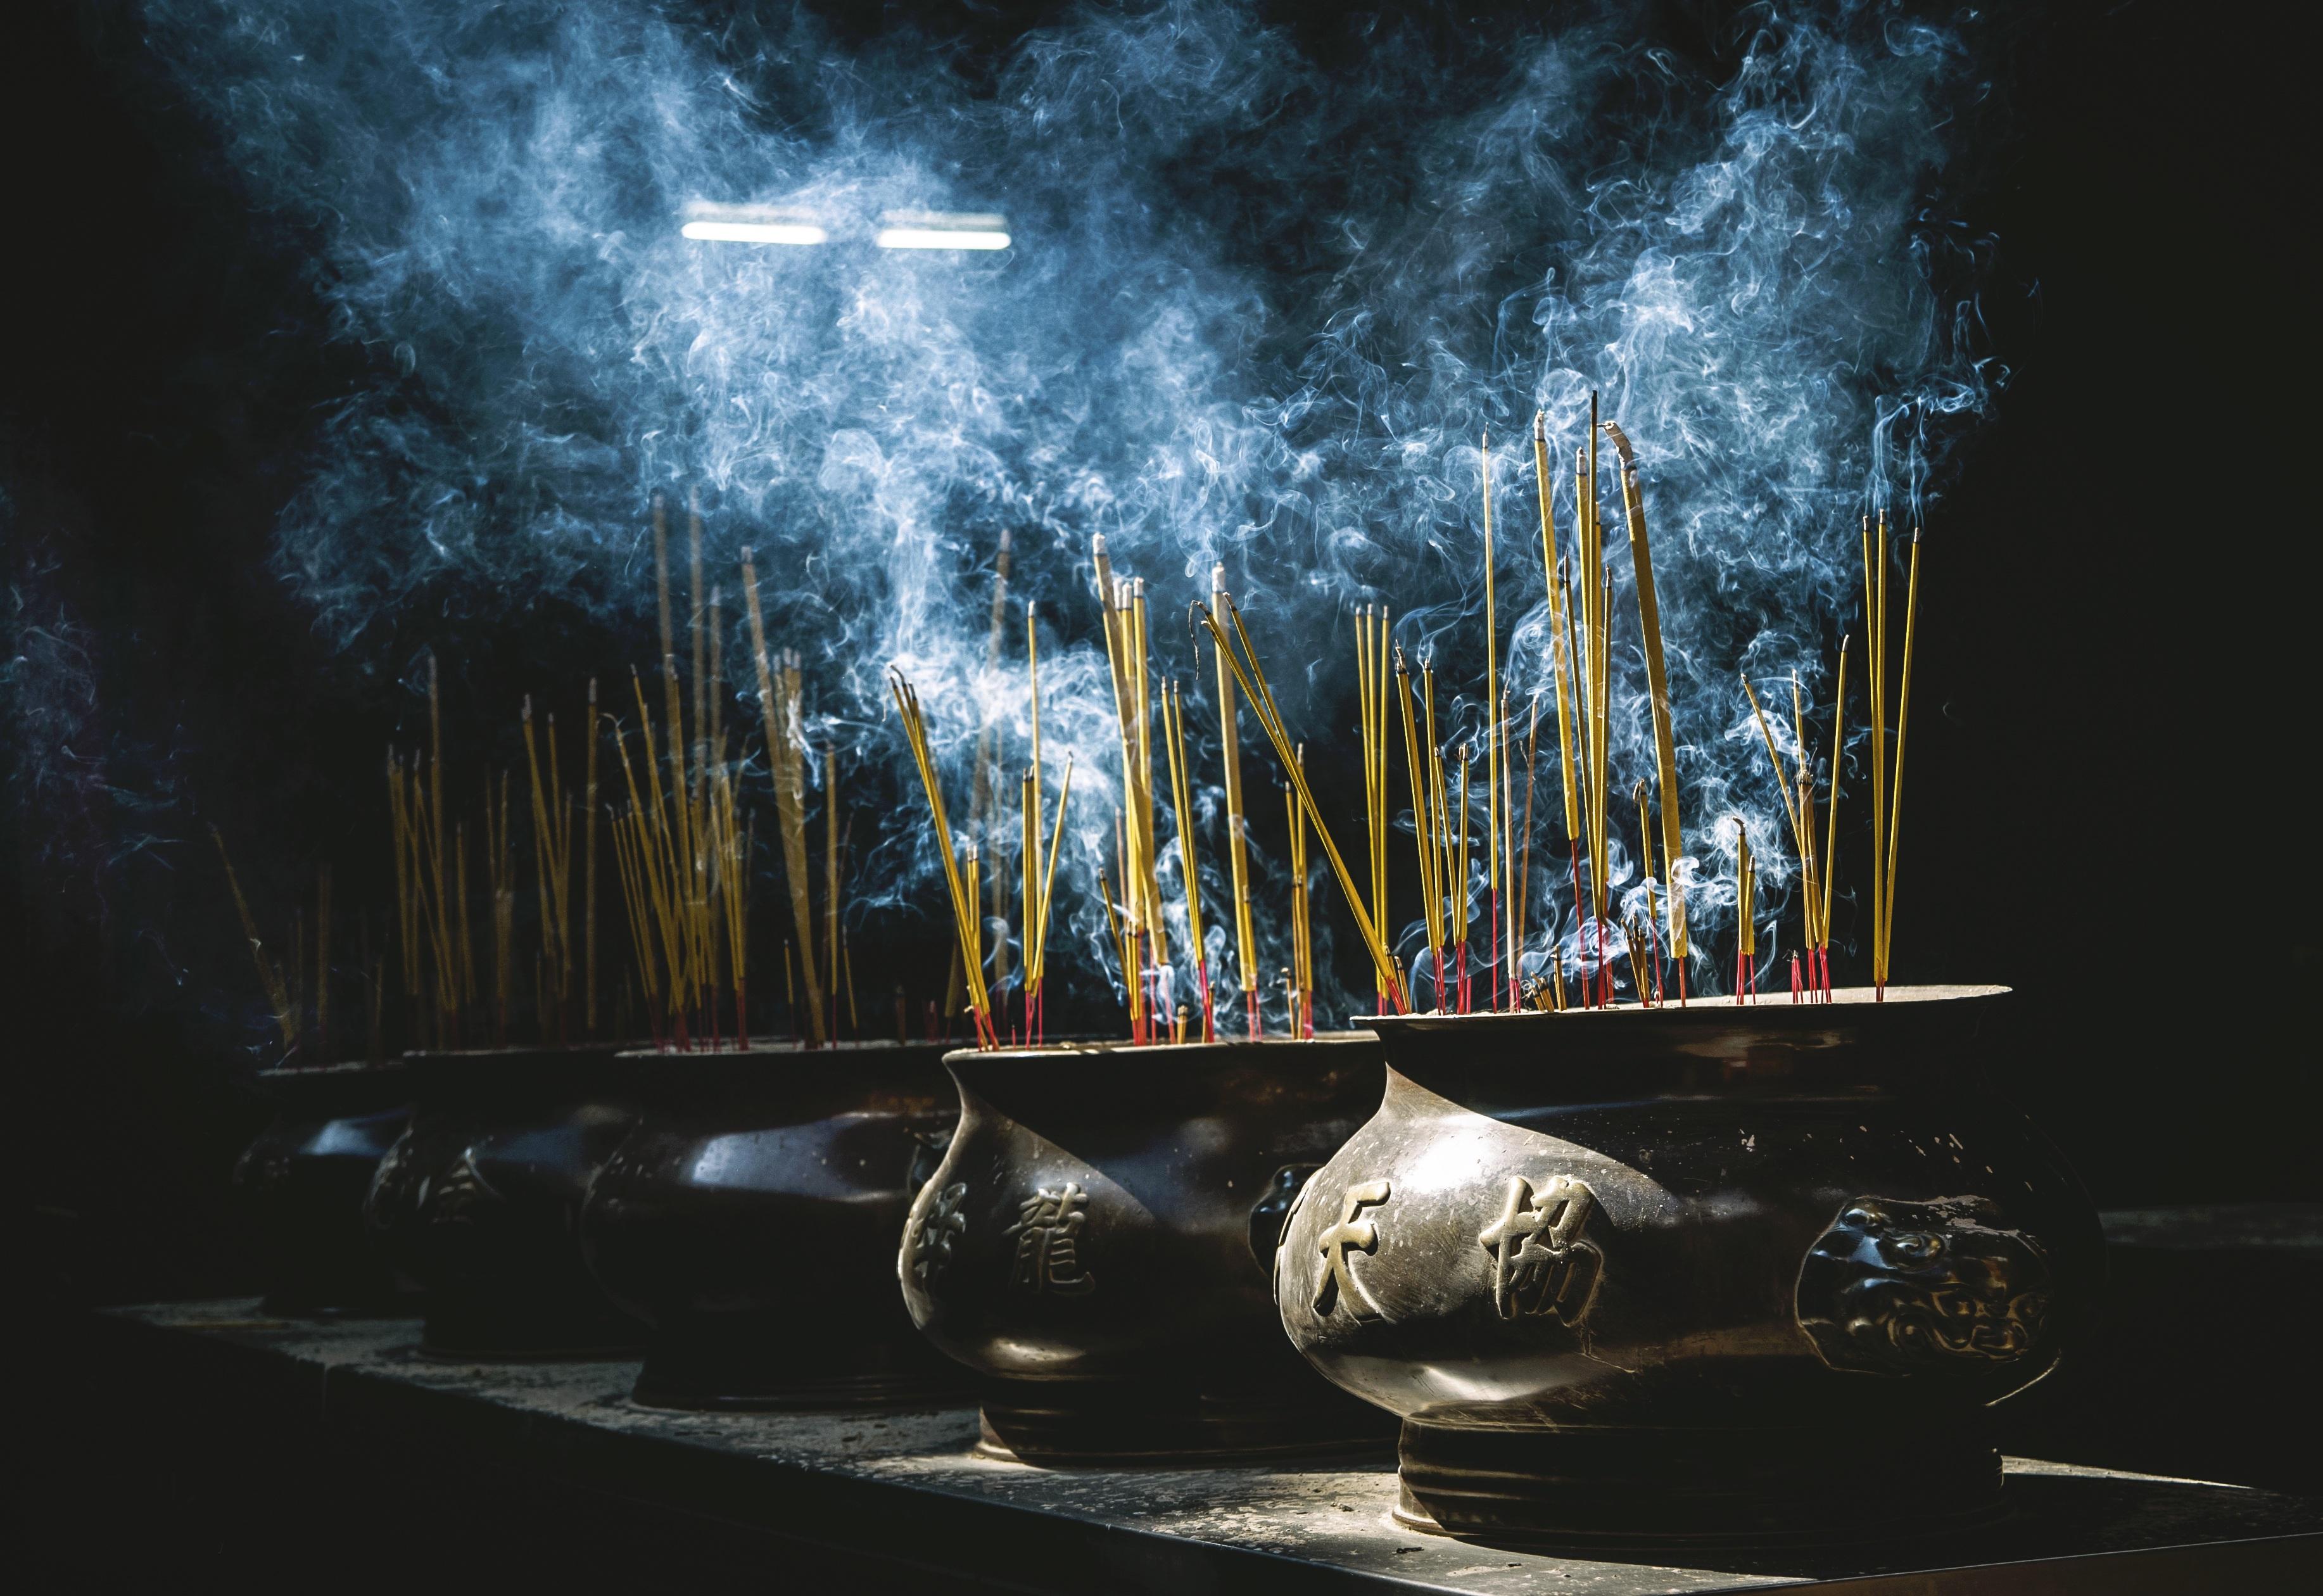 Free Images Light Night Smoke Reflection Darkness Pottery